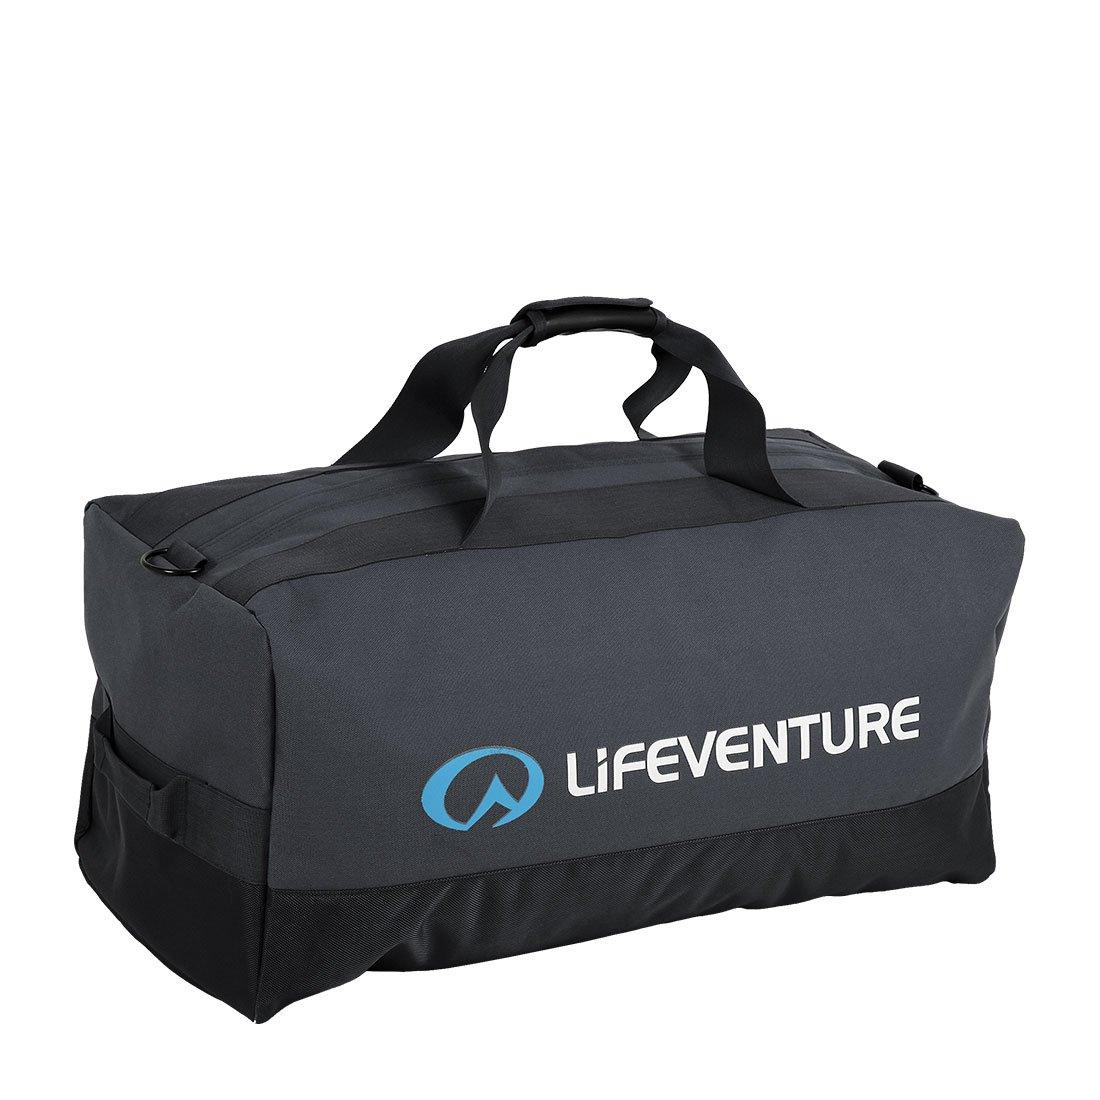 790a8ab0d60 Expedition Duffle Bag   100 Litre Duffle Bag   Lifeventure Netherlands